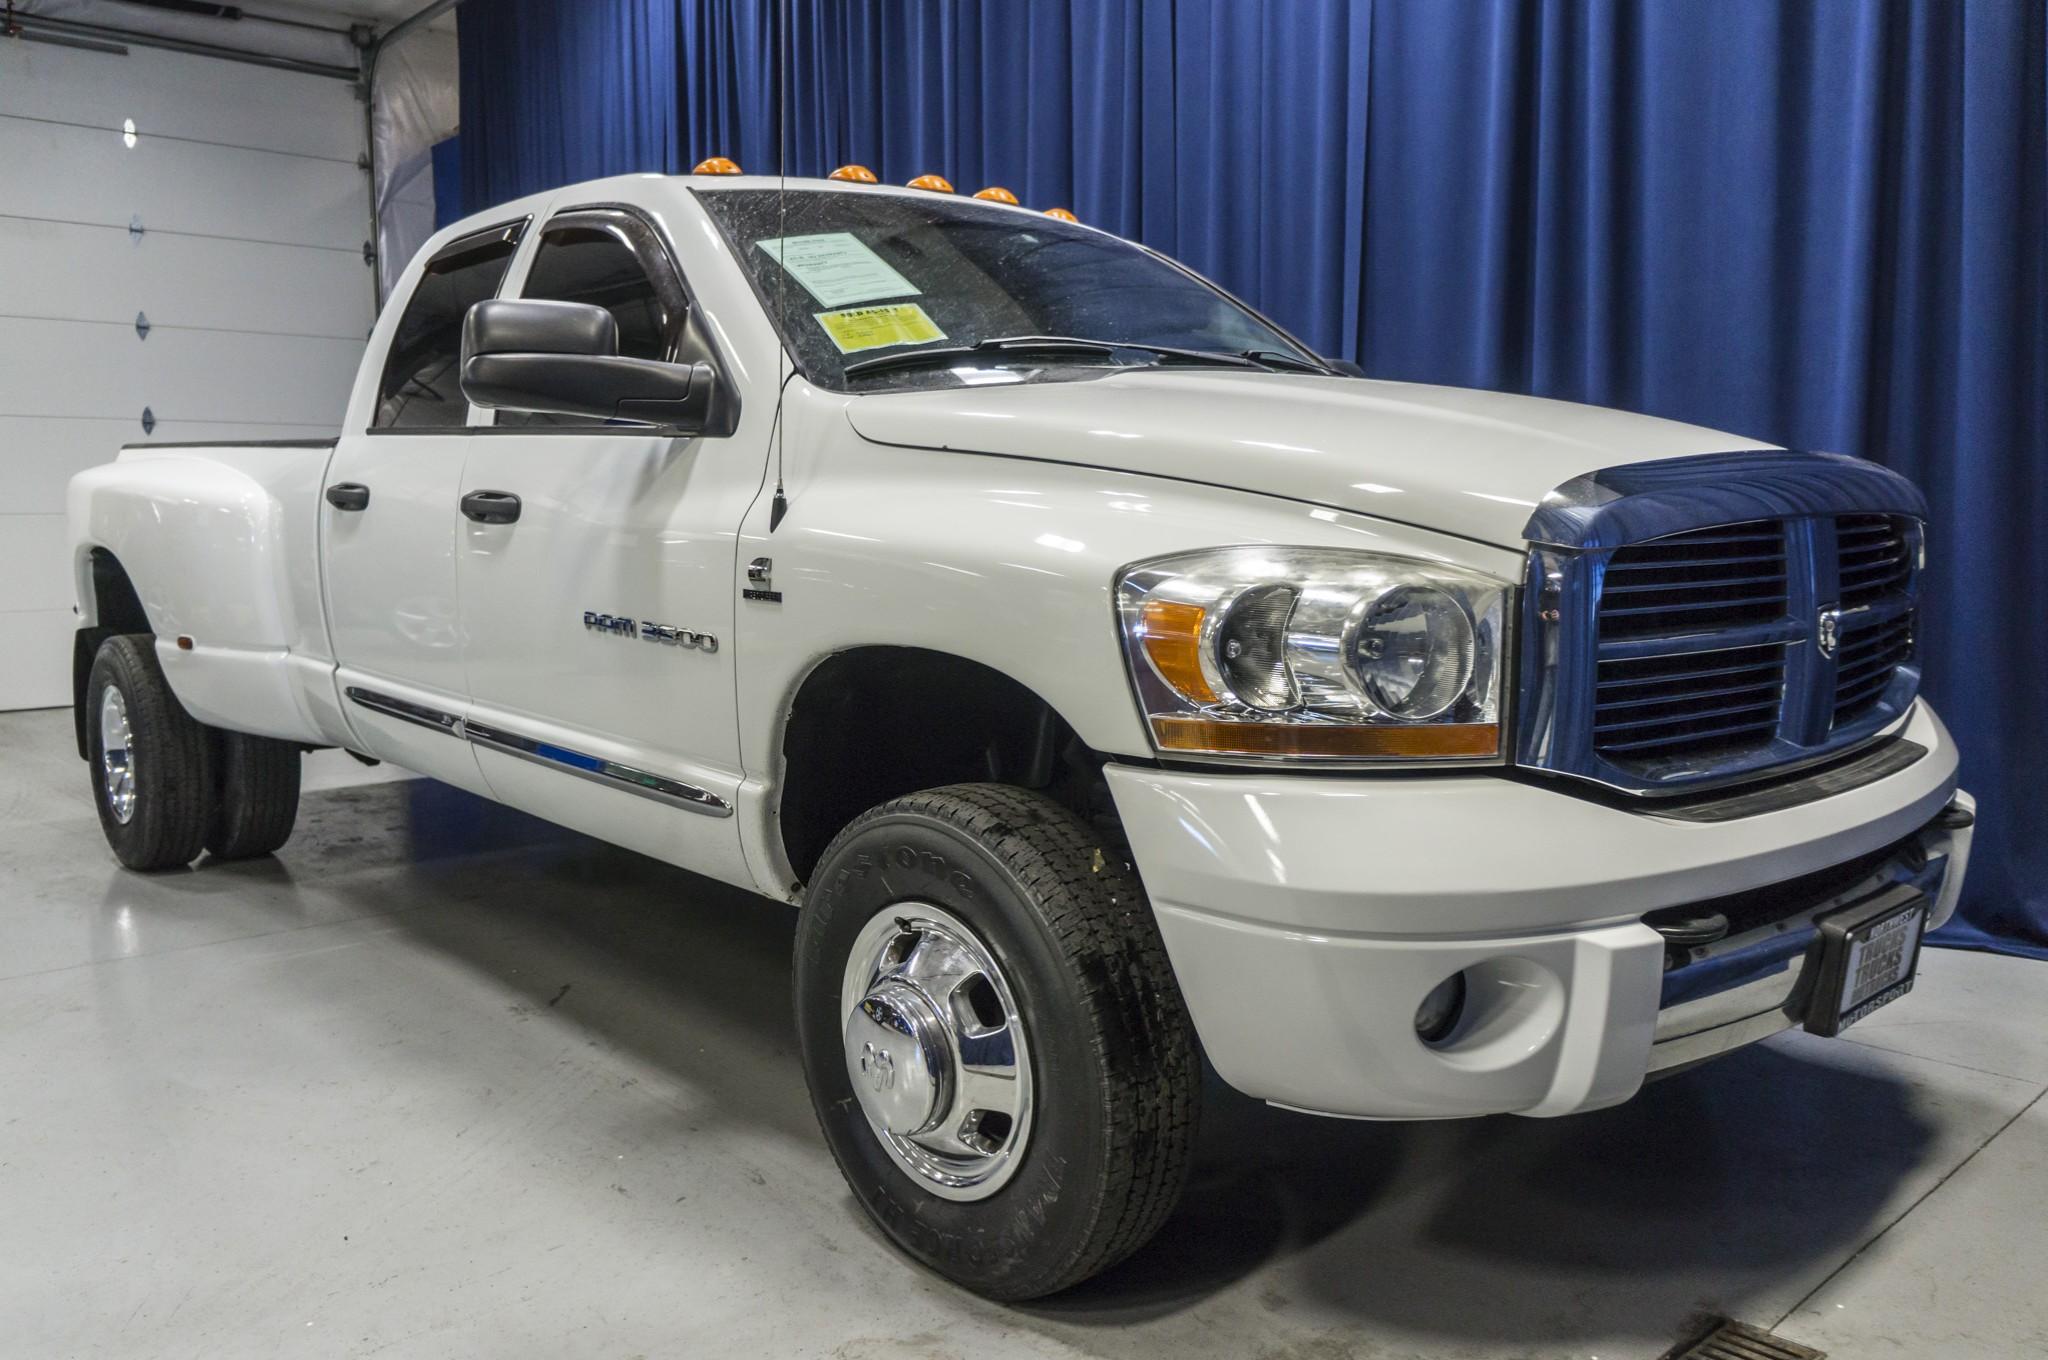 used 2006 dodge ram 3500 laramie dually 4x4 diesel truck for sale 36710a. Black Bedroom Furniture Sets. Home Design Ideas